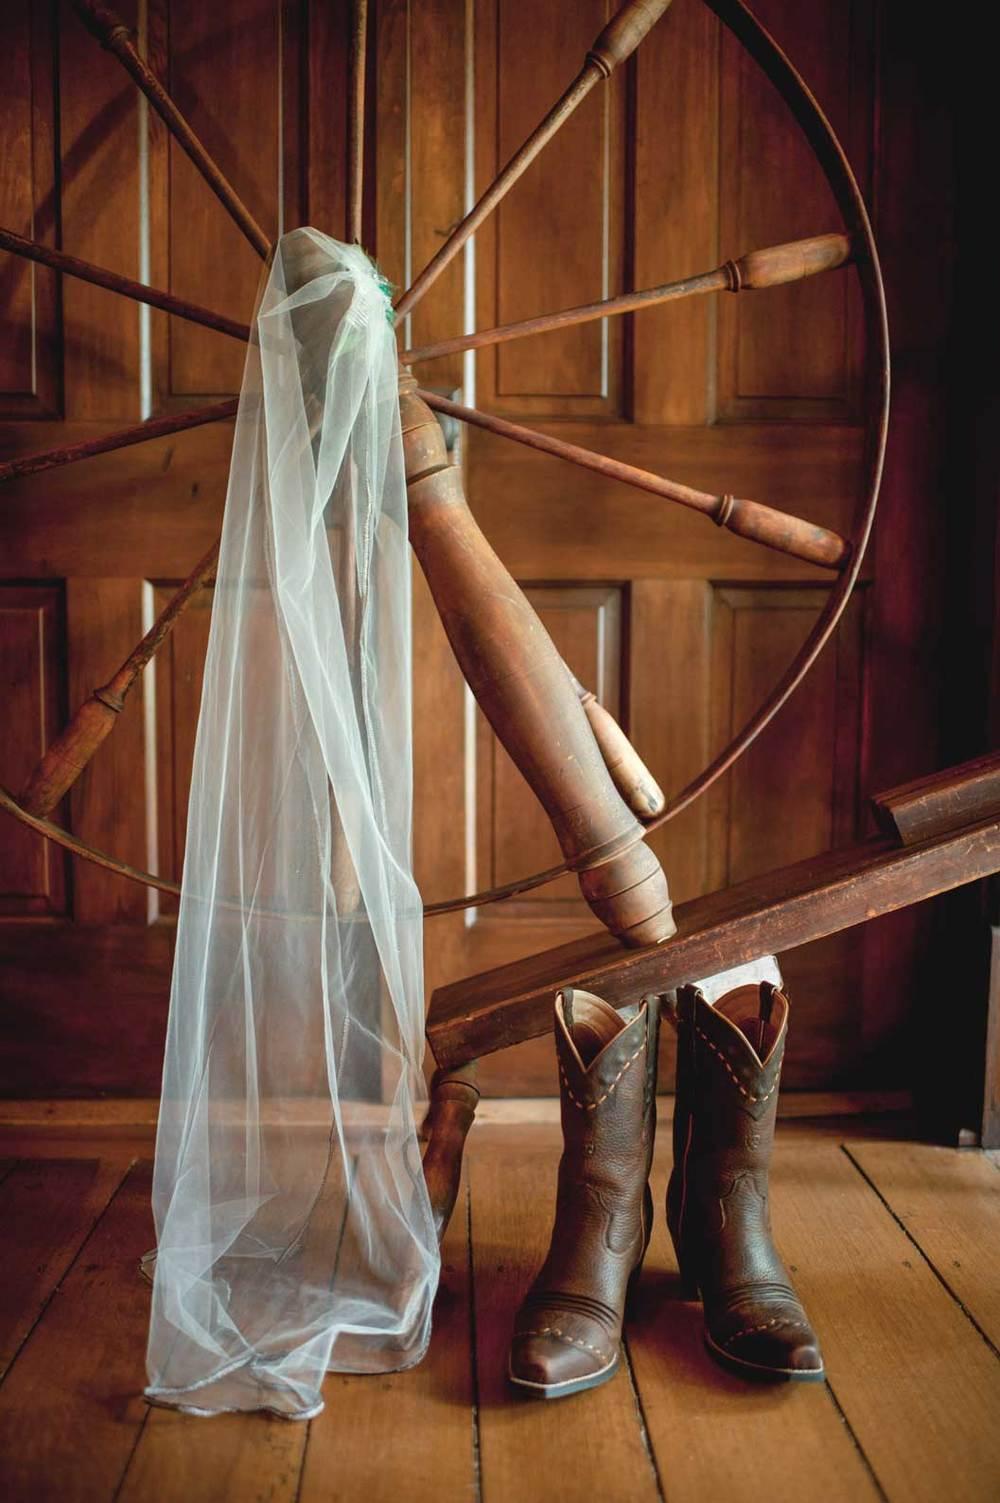 Cowboy boots and a wedding veil